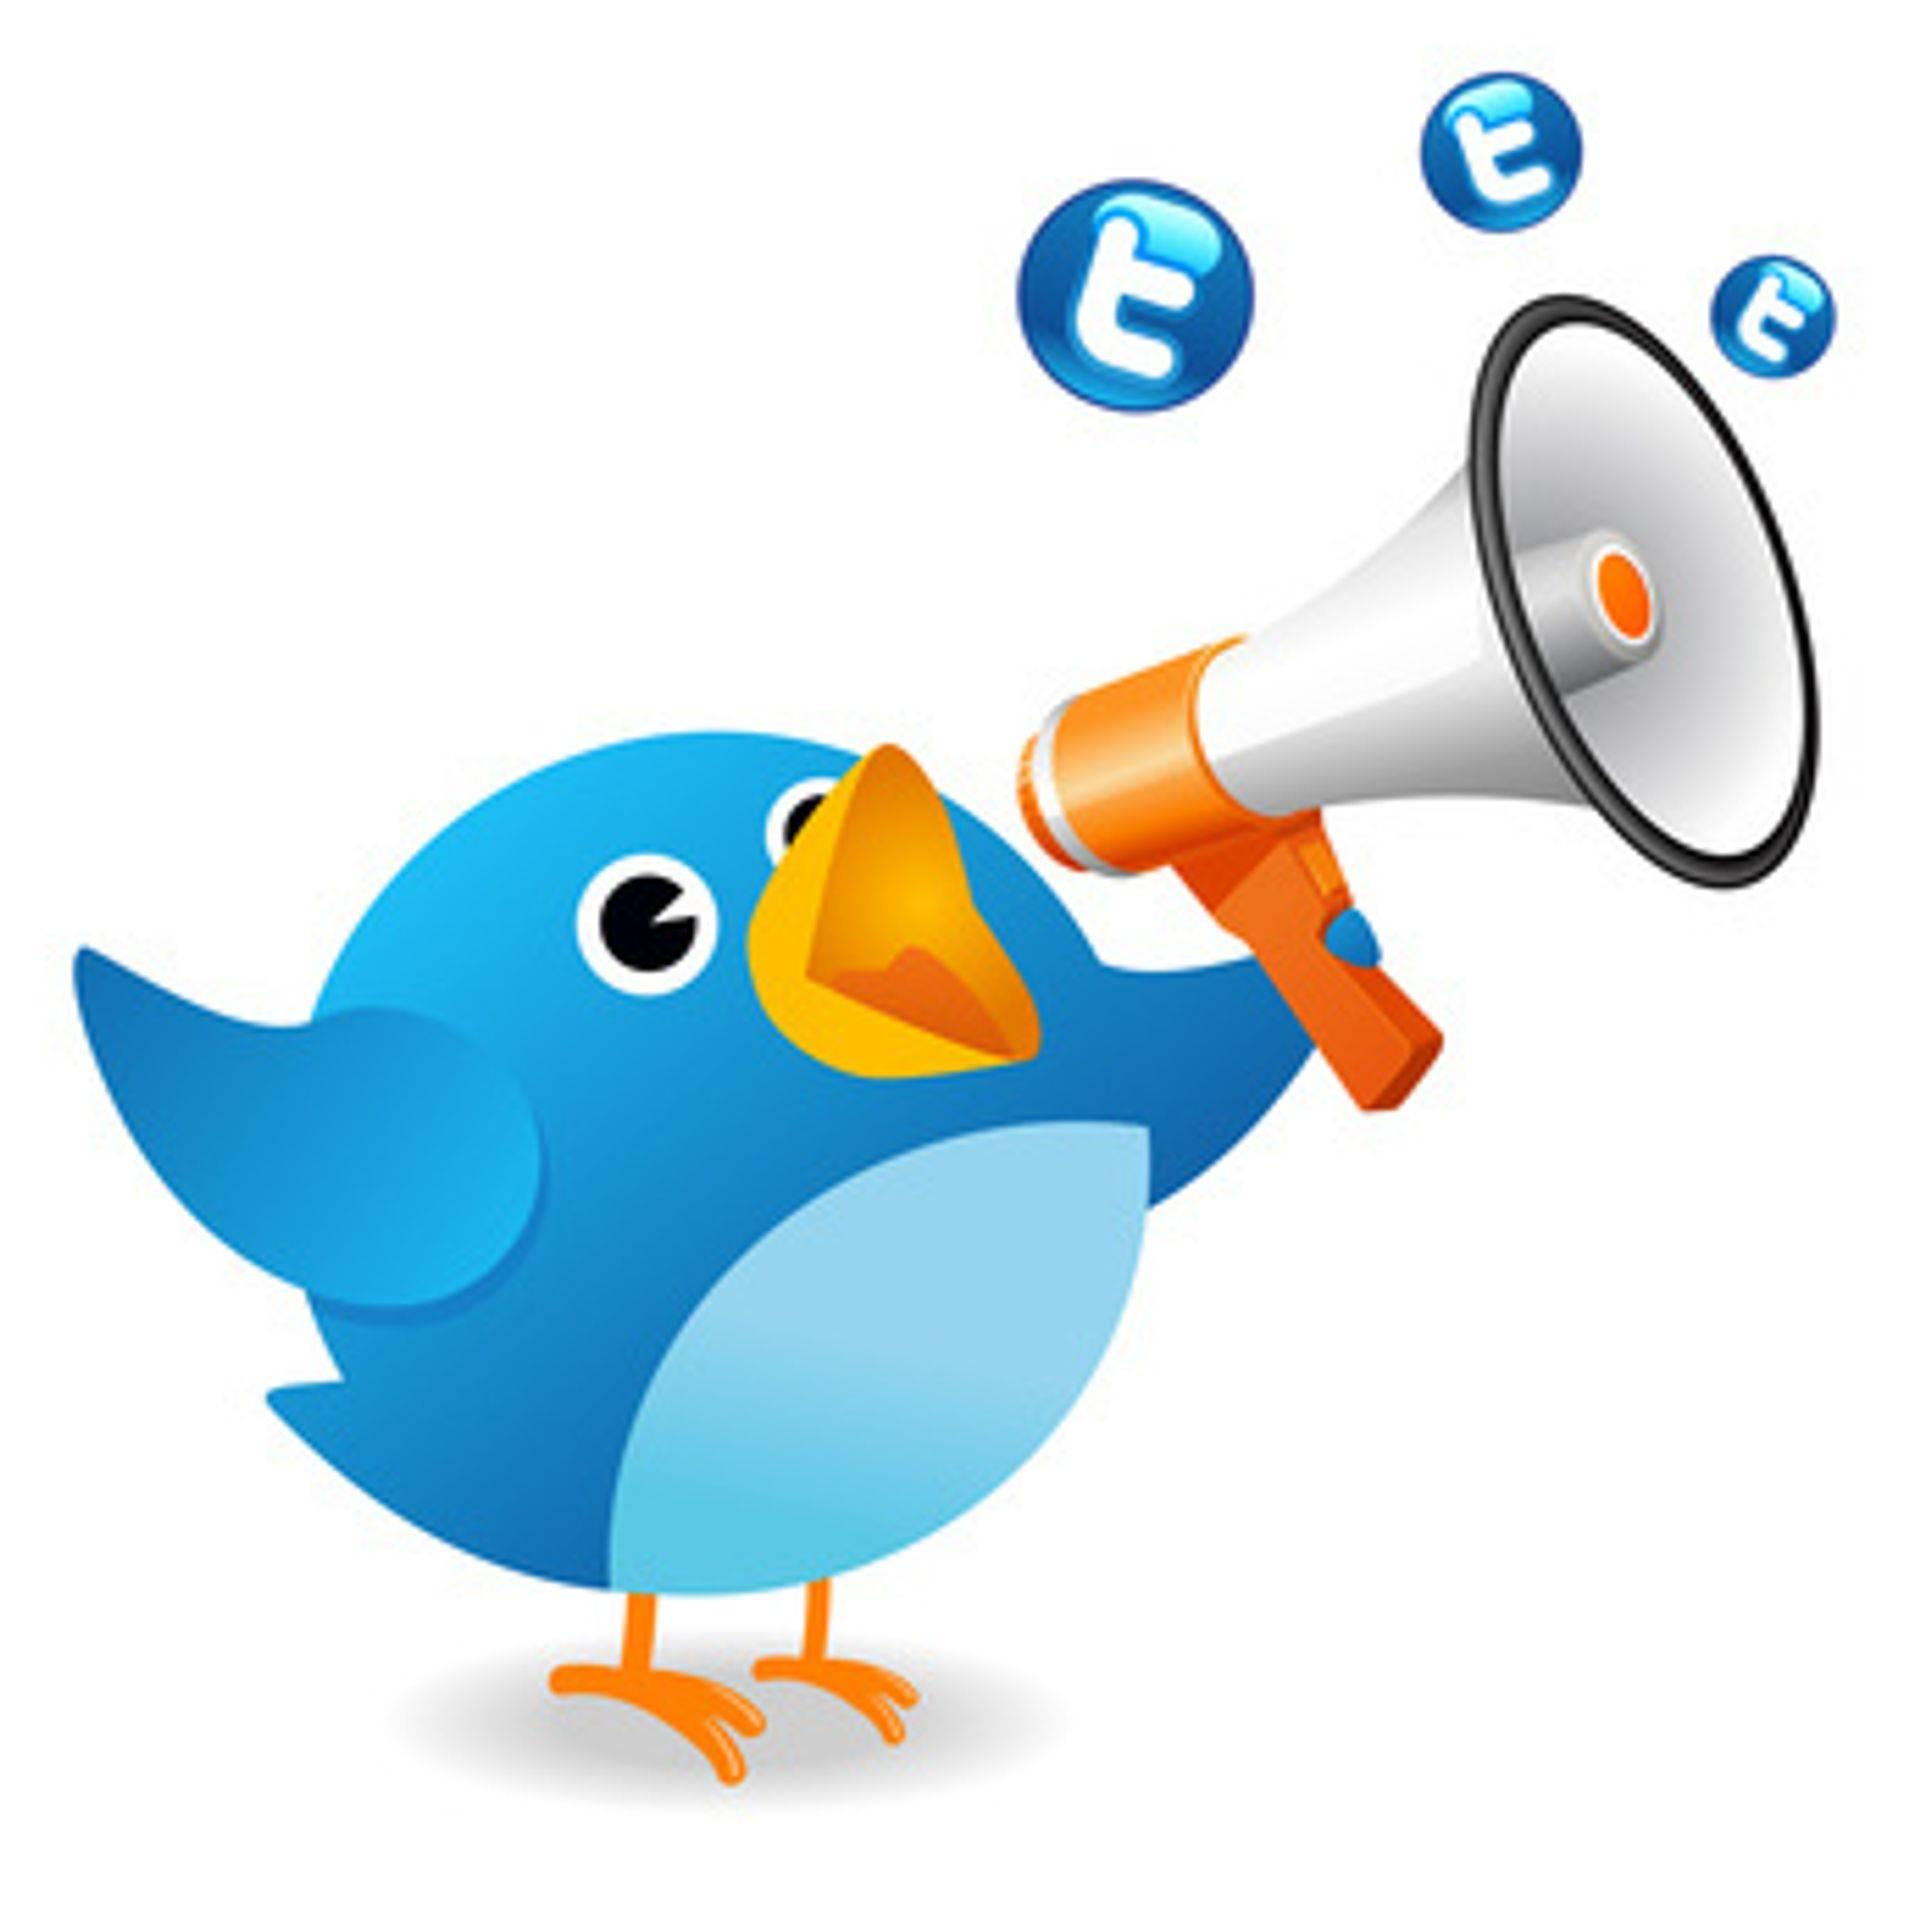 Twitter Shoutouts! Gain new followers!